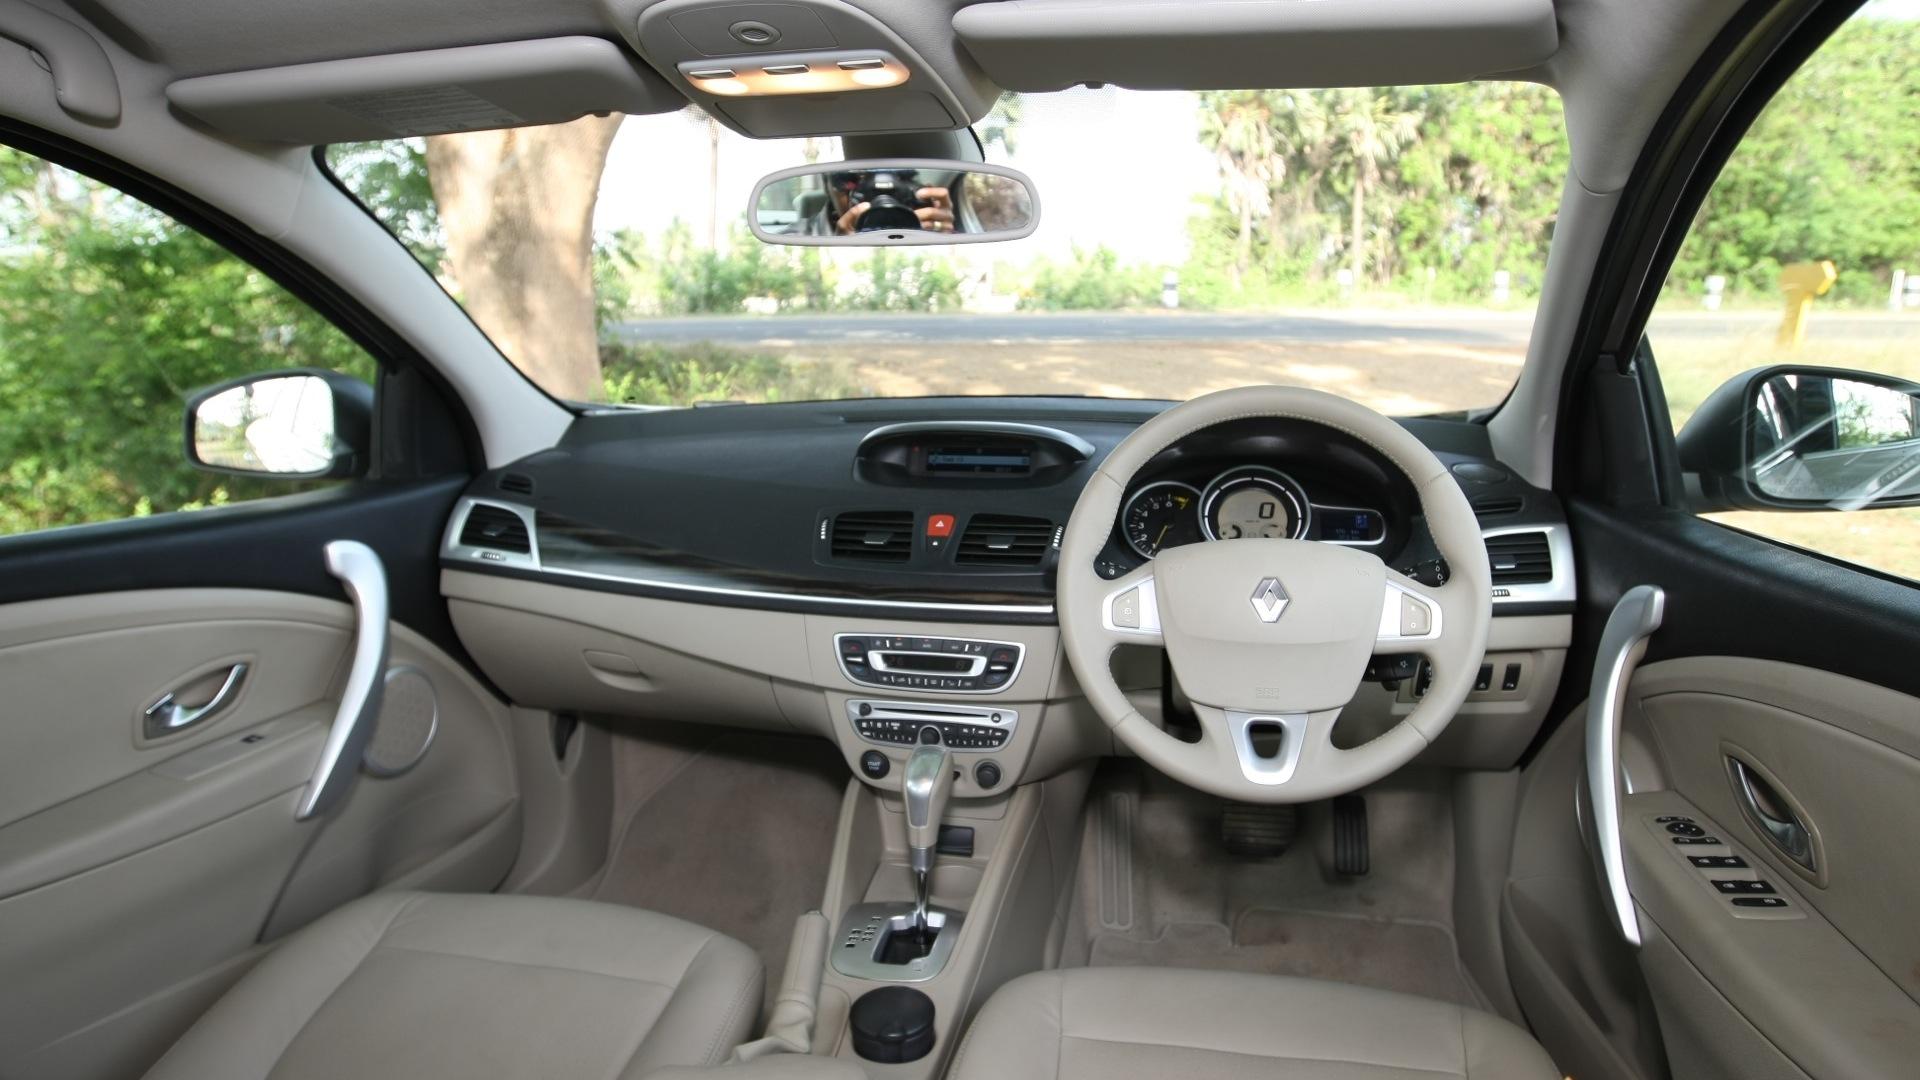 Renault Fluence 2013 Diesel Car Photos Overdrive